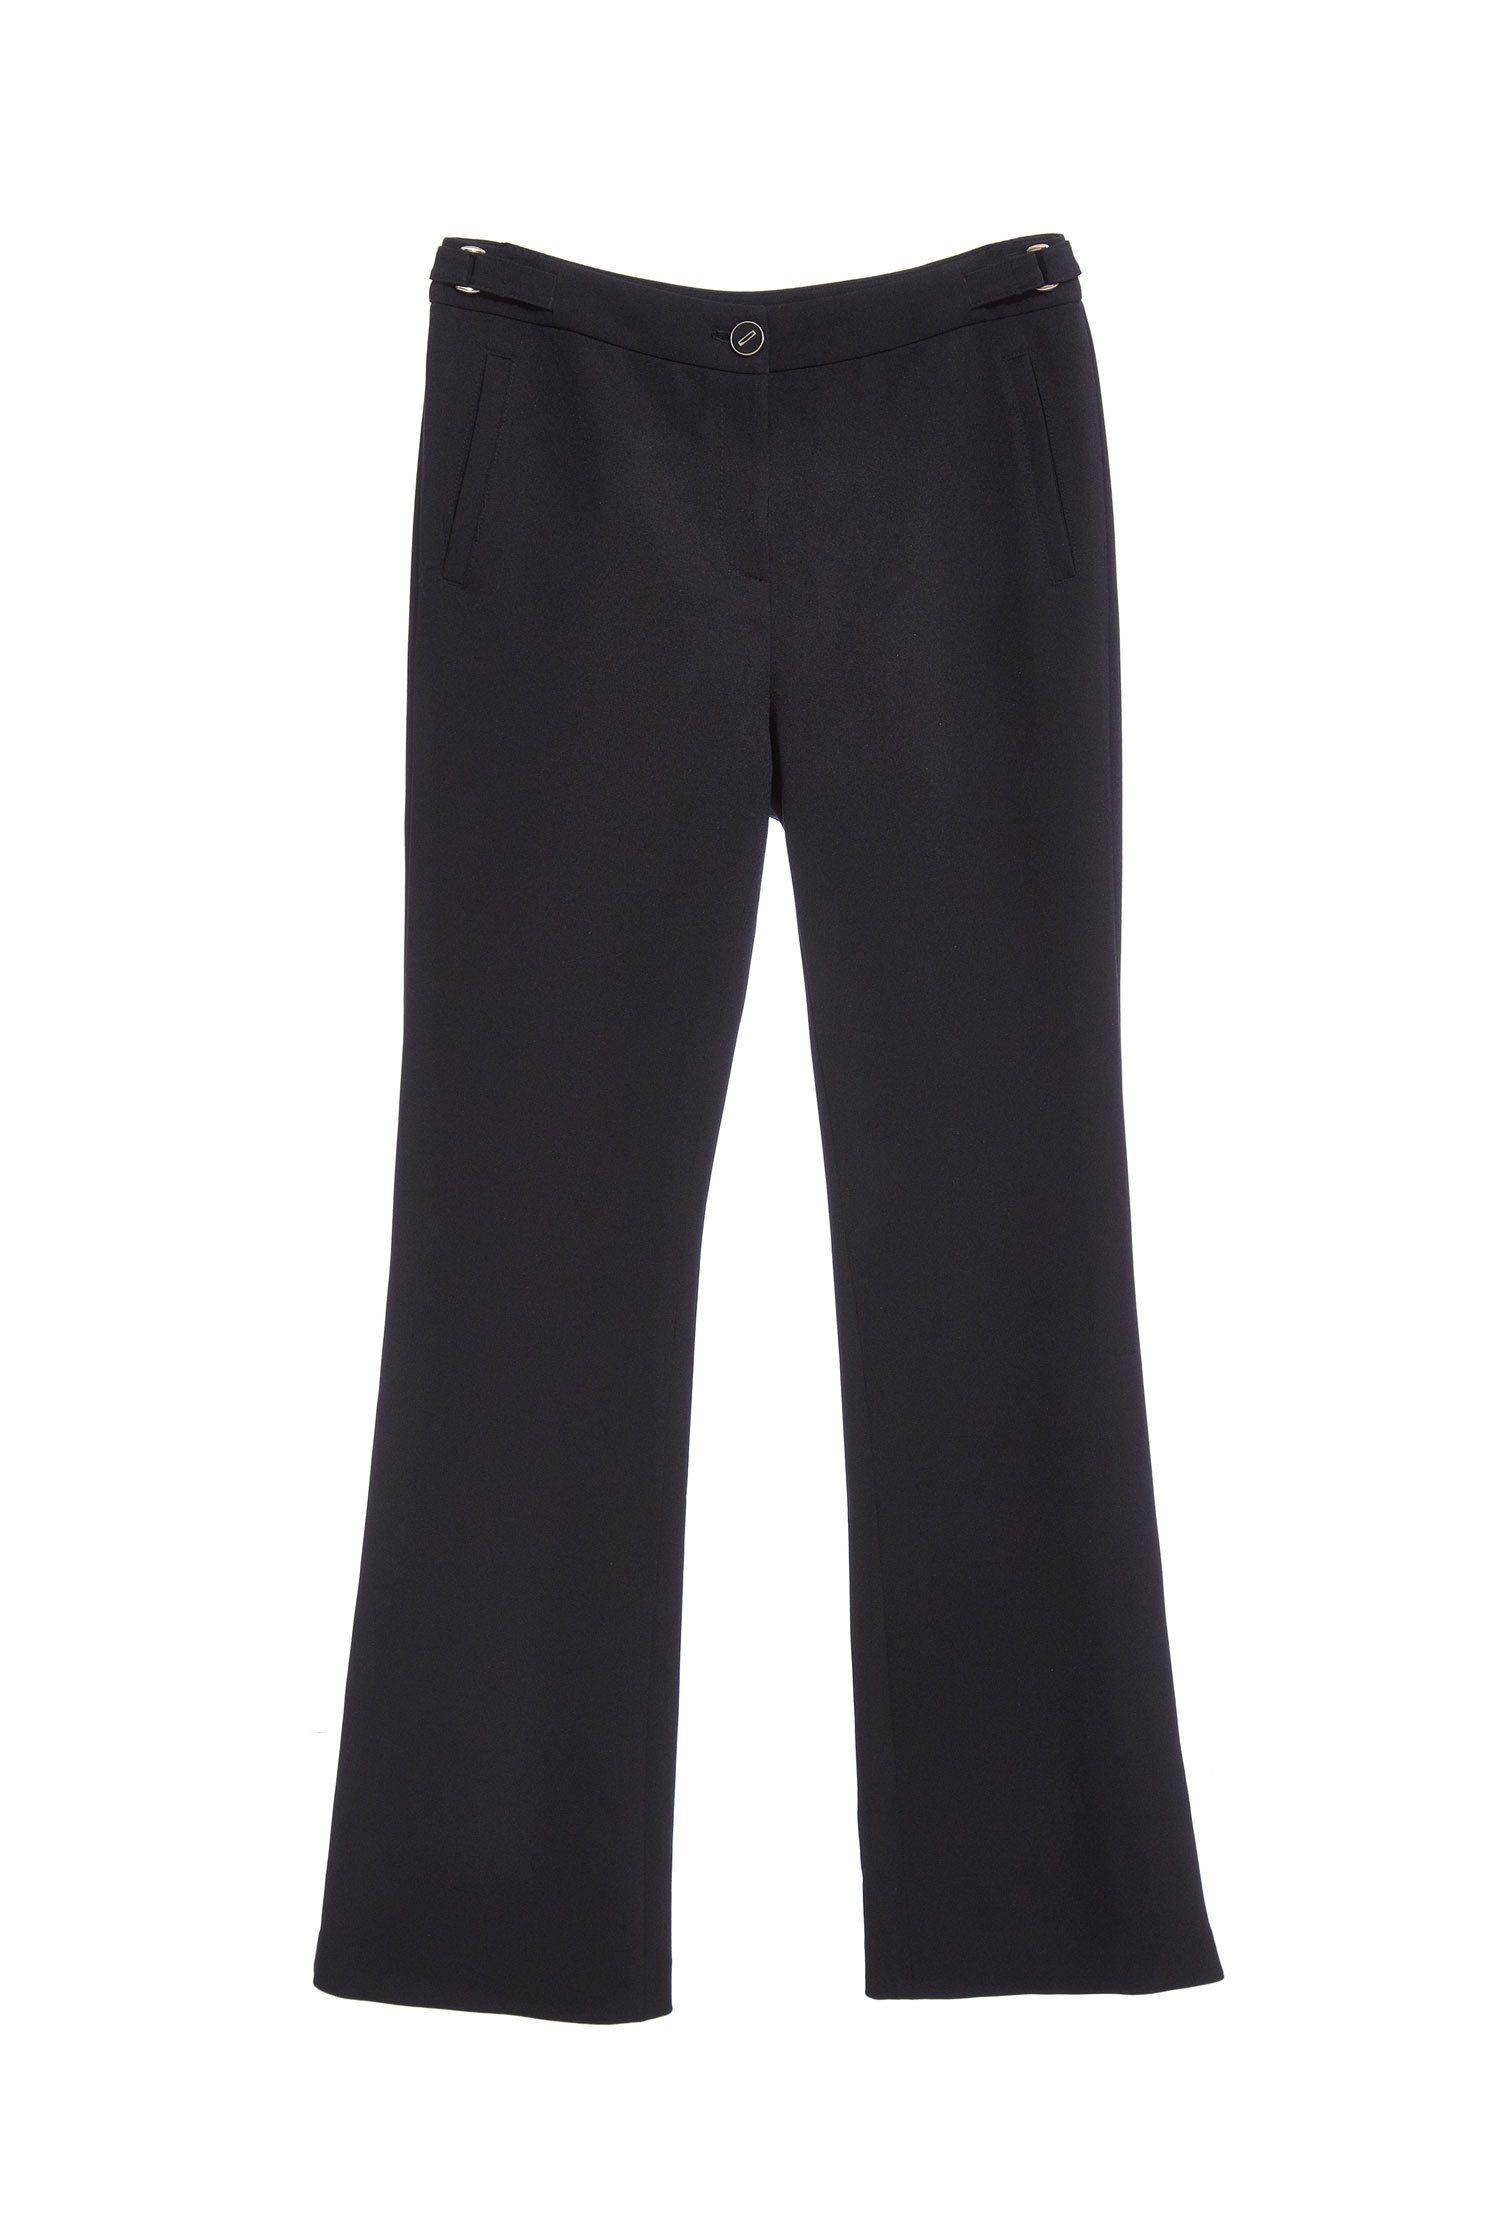 Urban flare pants